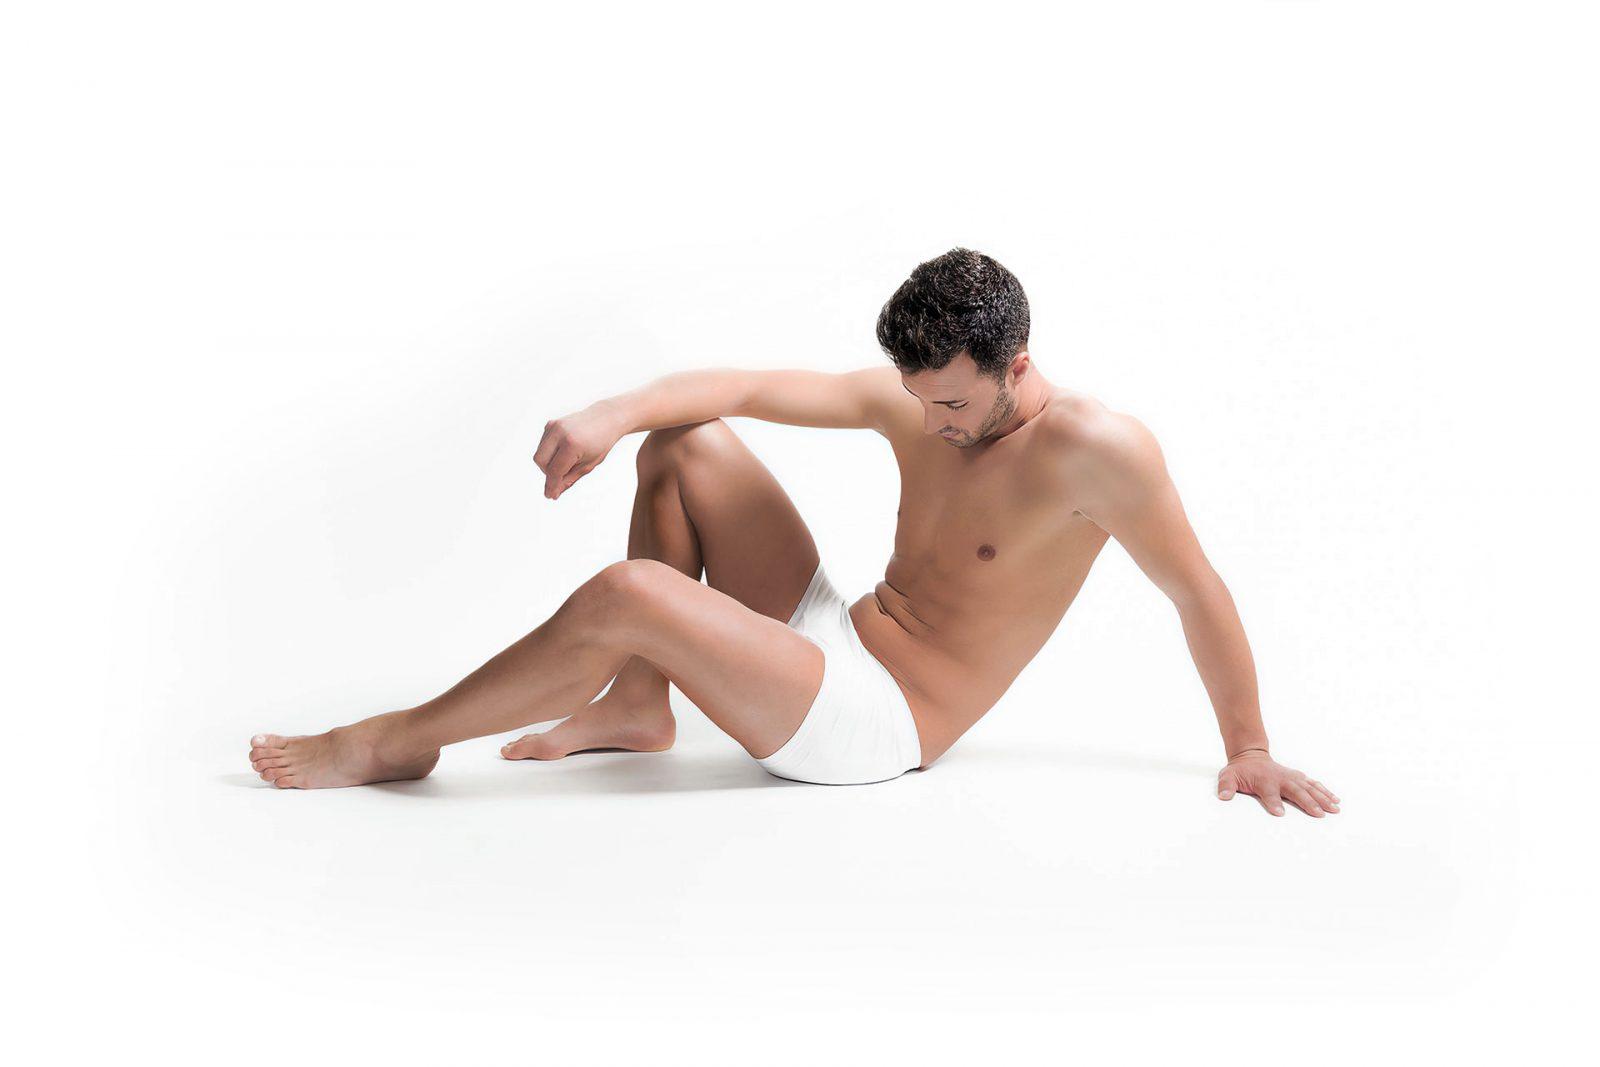 bodycience, corpo, homem